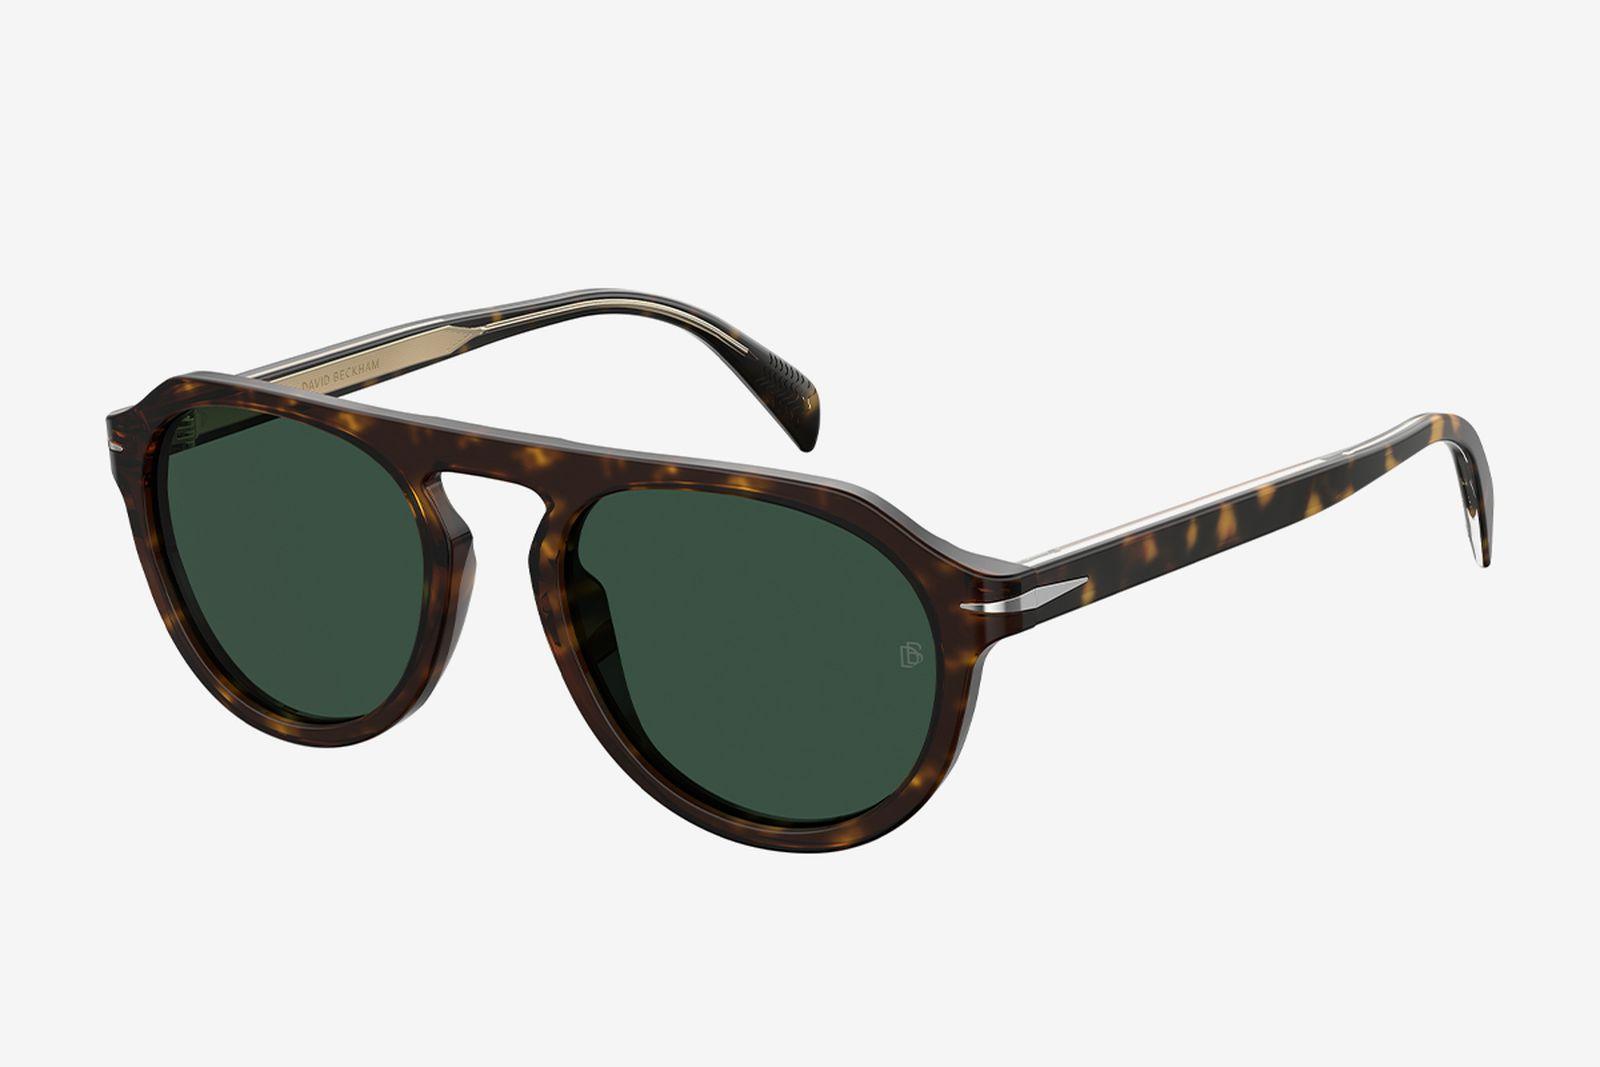 db-sunglasses-ss20-04